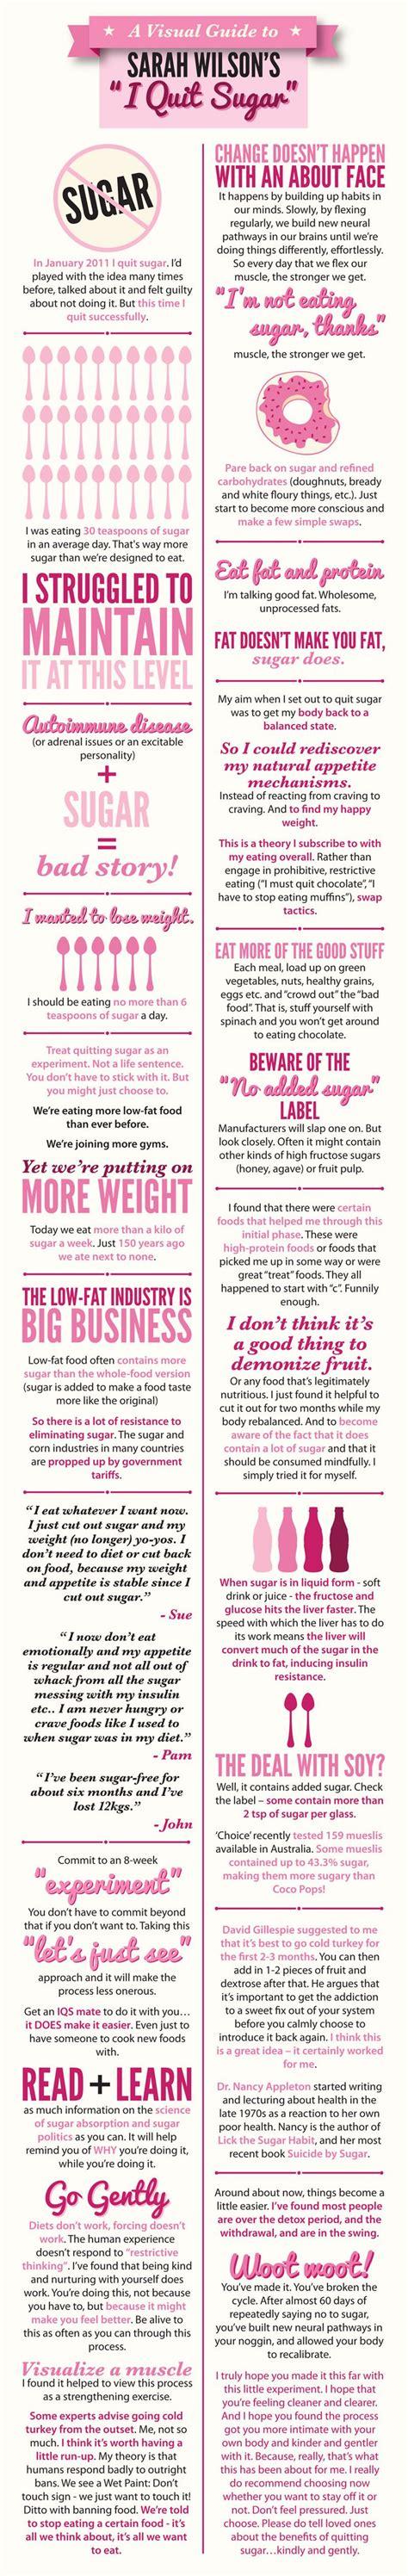 Sugar Detox Plan Alpert by 25 Best Ideas About Sugar Detox Plan On Low